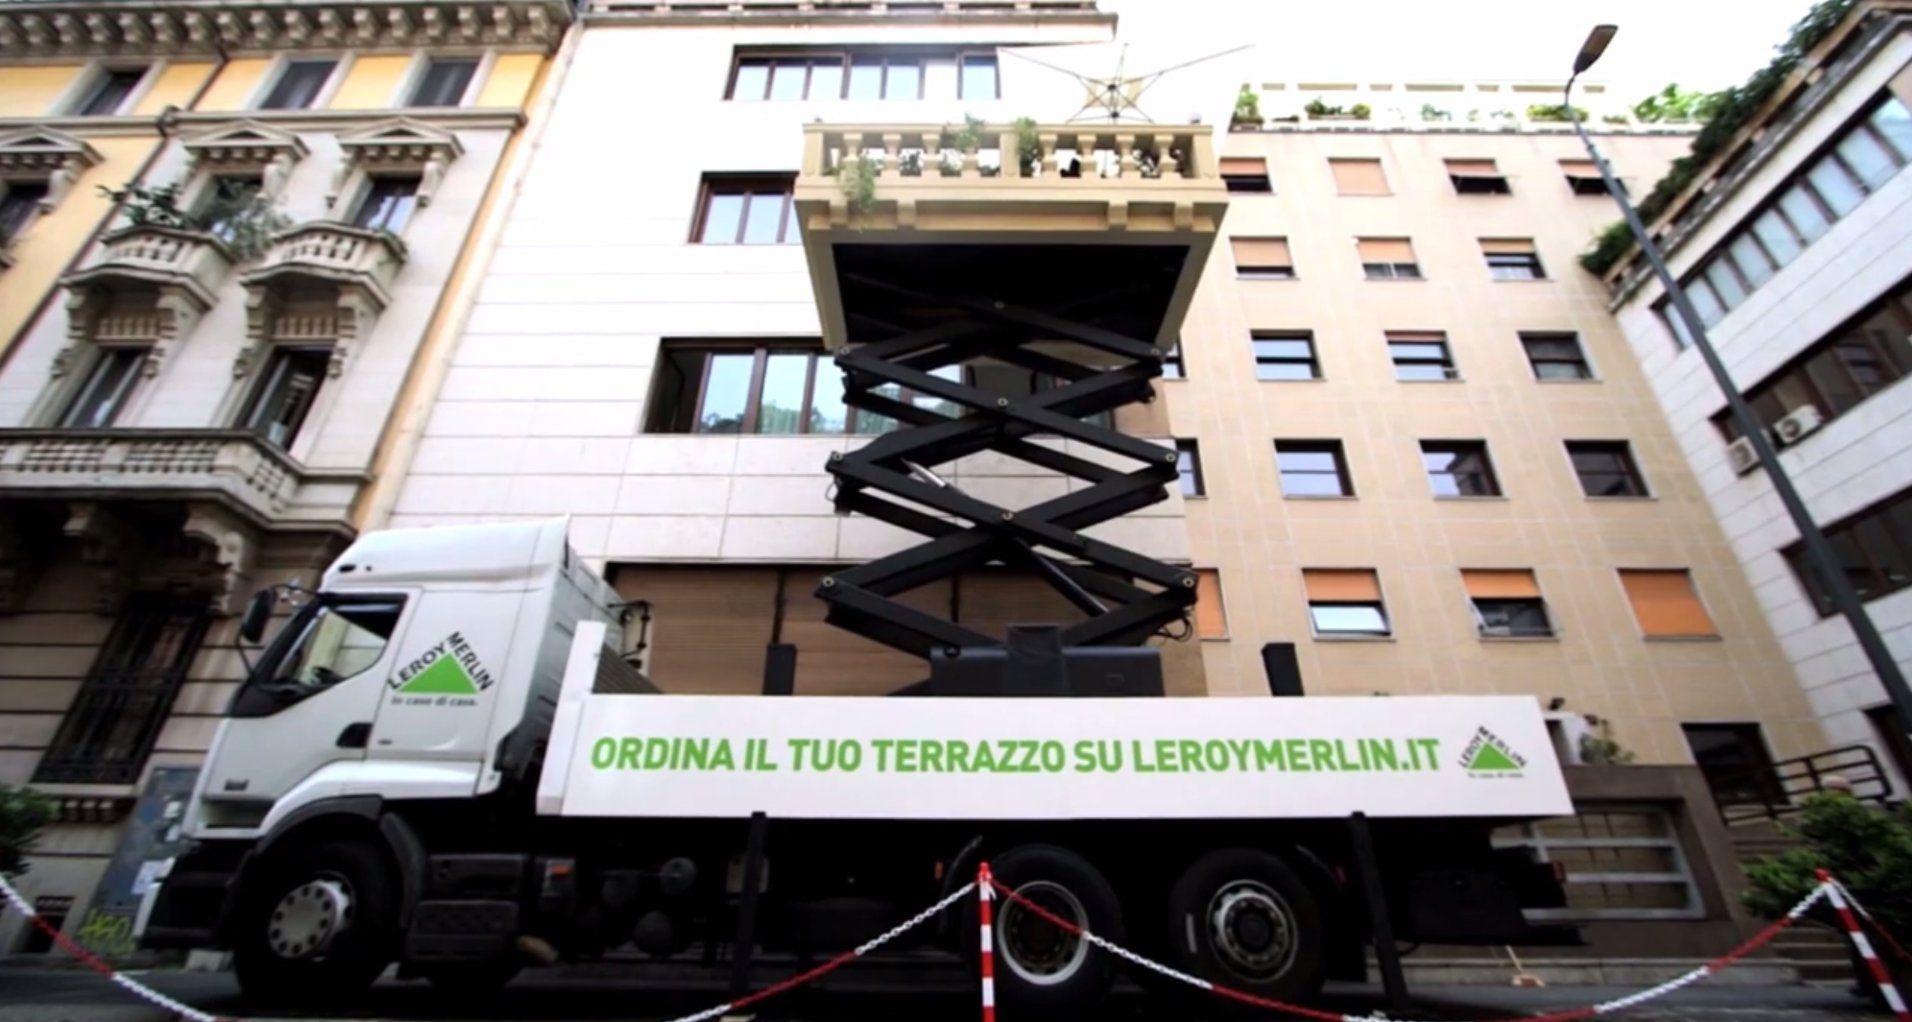 Balconyexpress For Leroy Merlin Italia Guerrilla Marketing And  ~ Redes Para Balcones Leroy Merlin